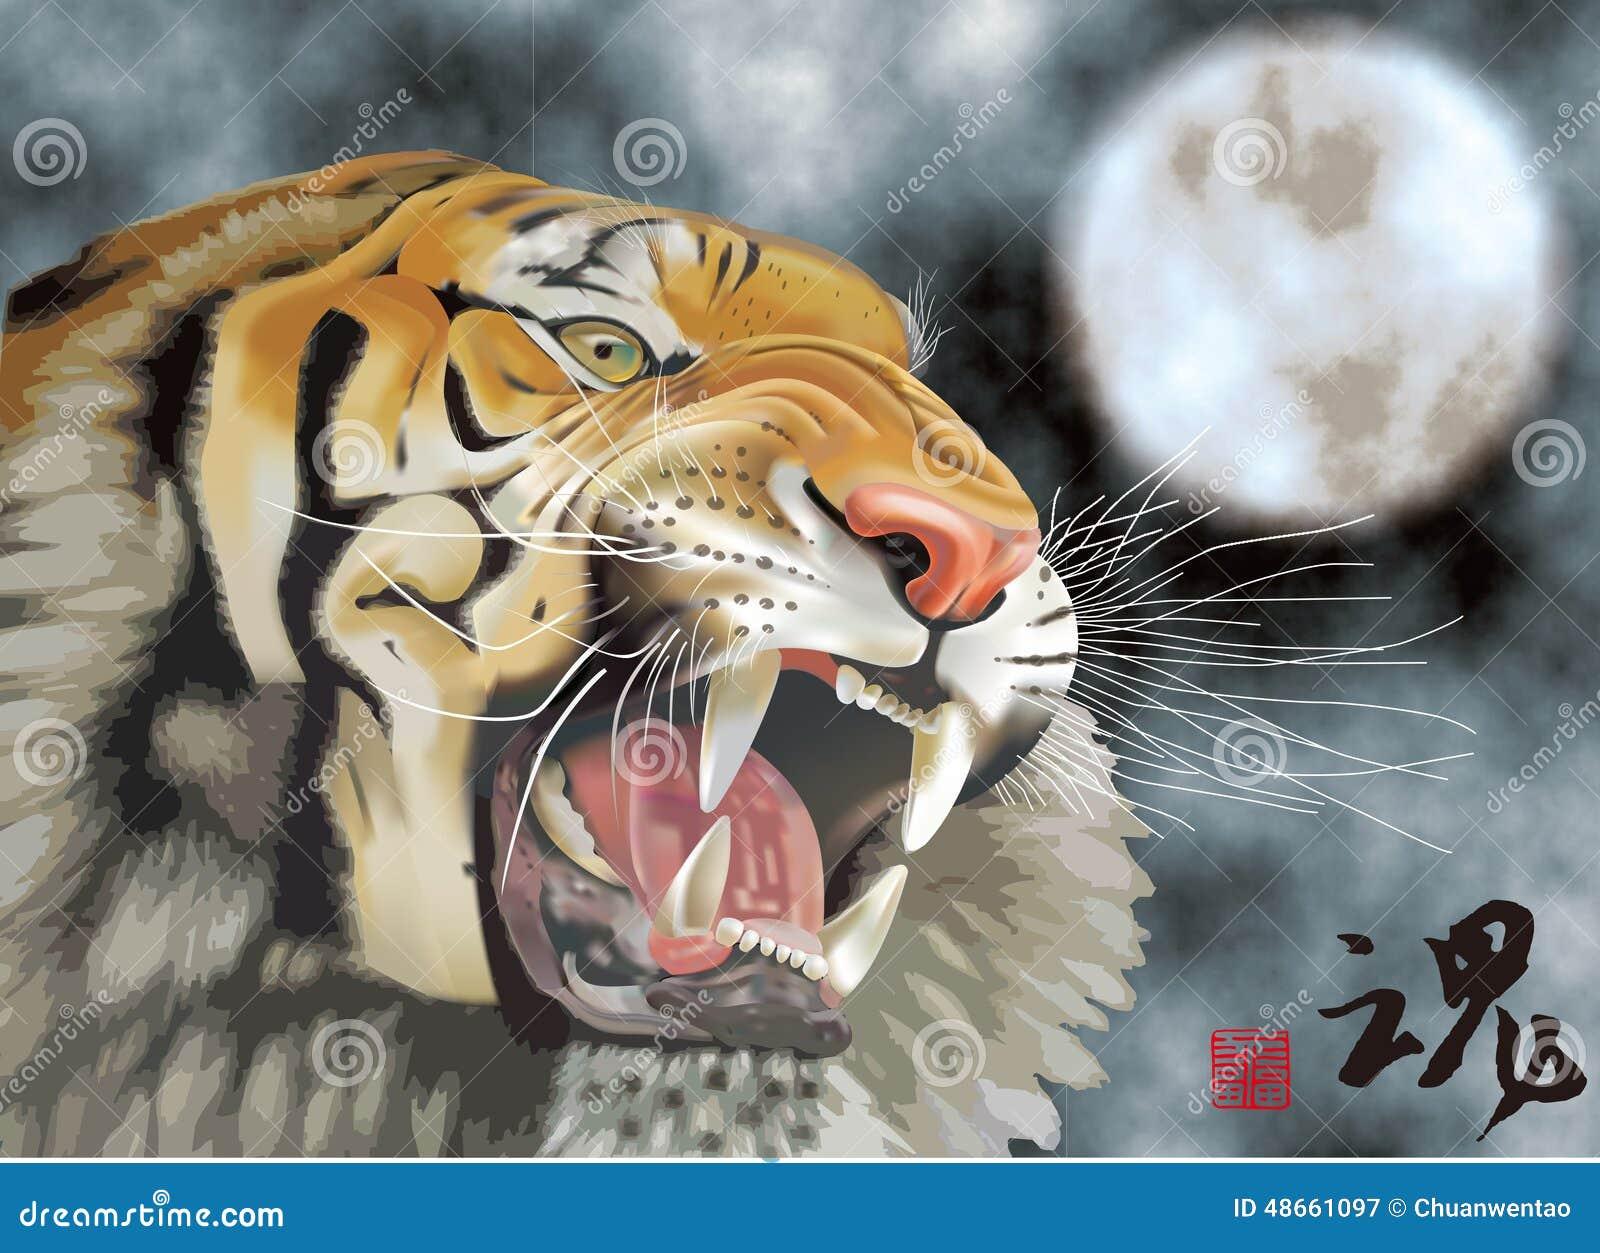 the tiger theme